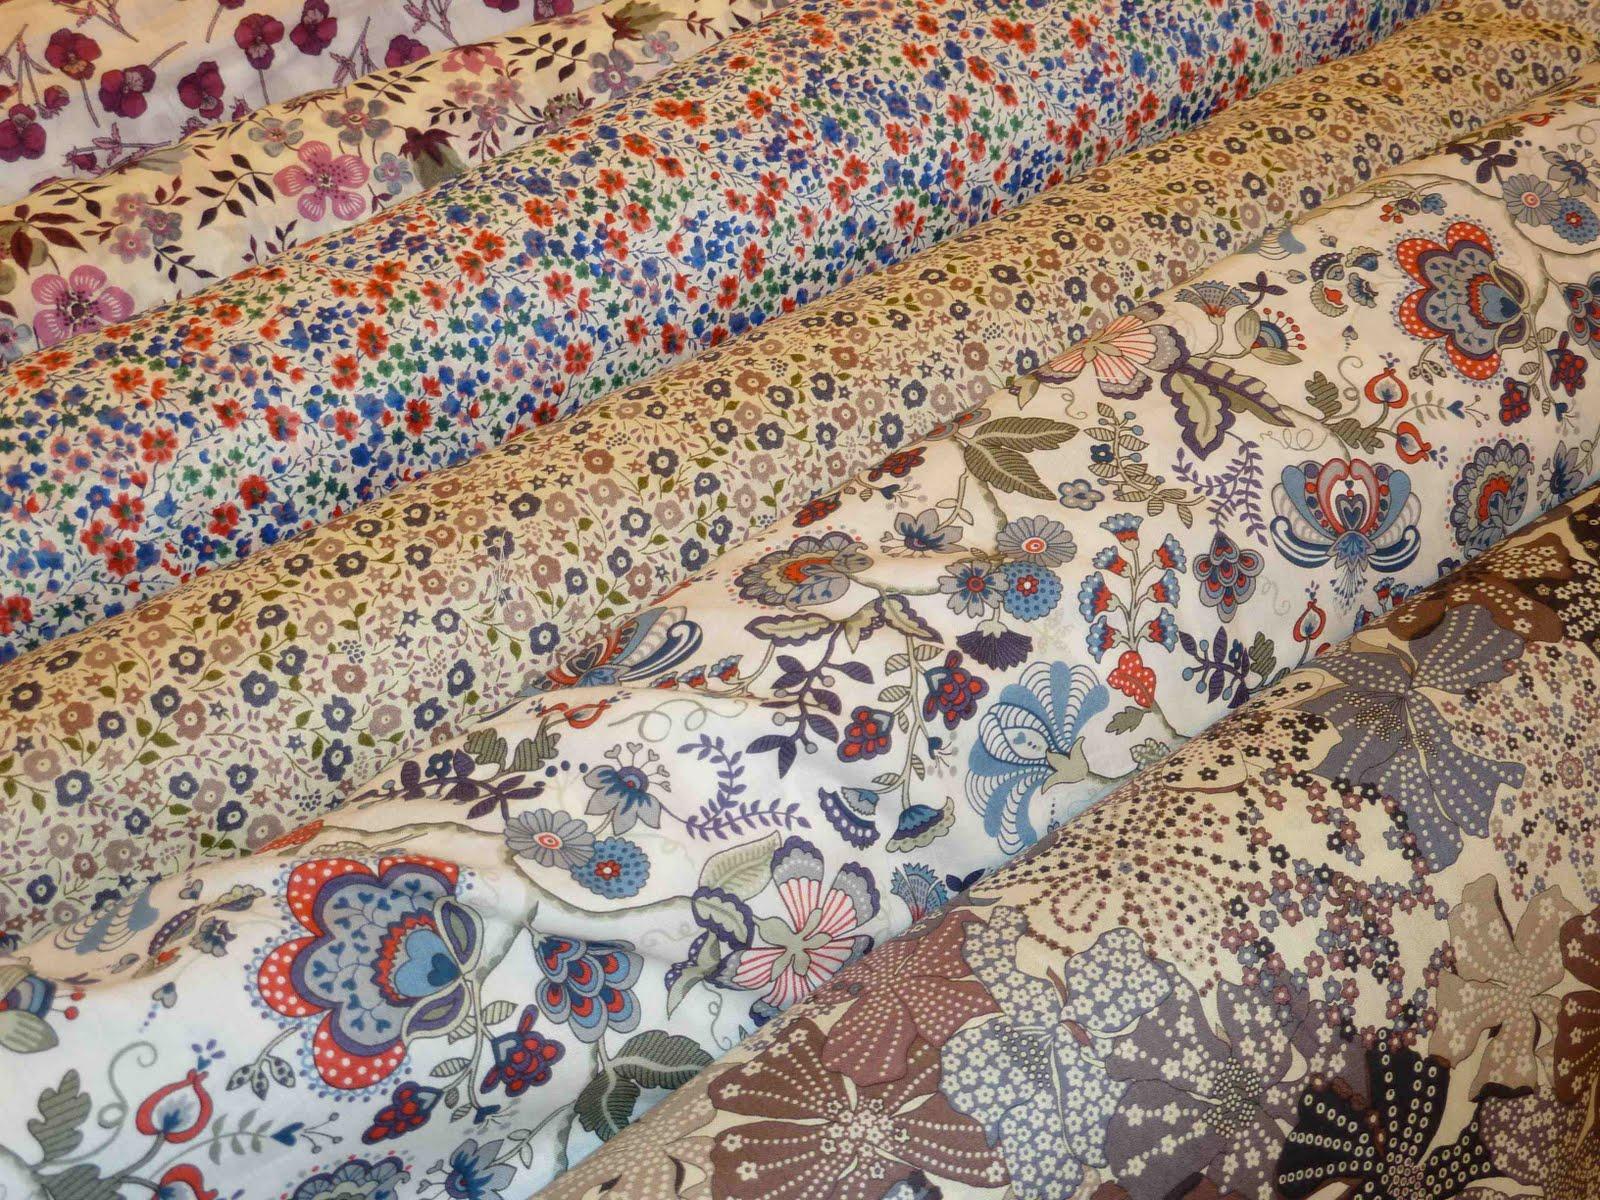 Copper kettles and woolen mittens septiembre 2010 - Catalogo telas el corte ingles ...